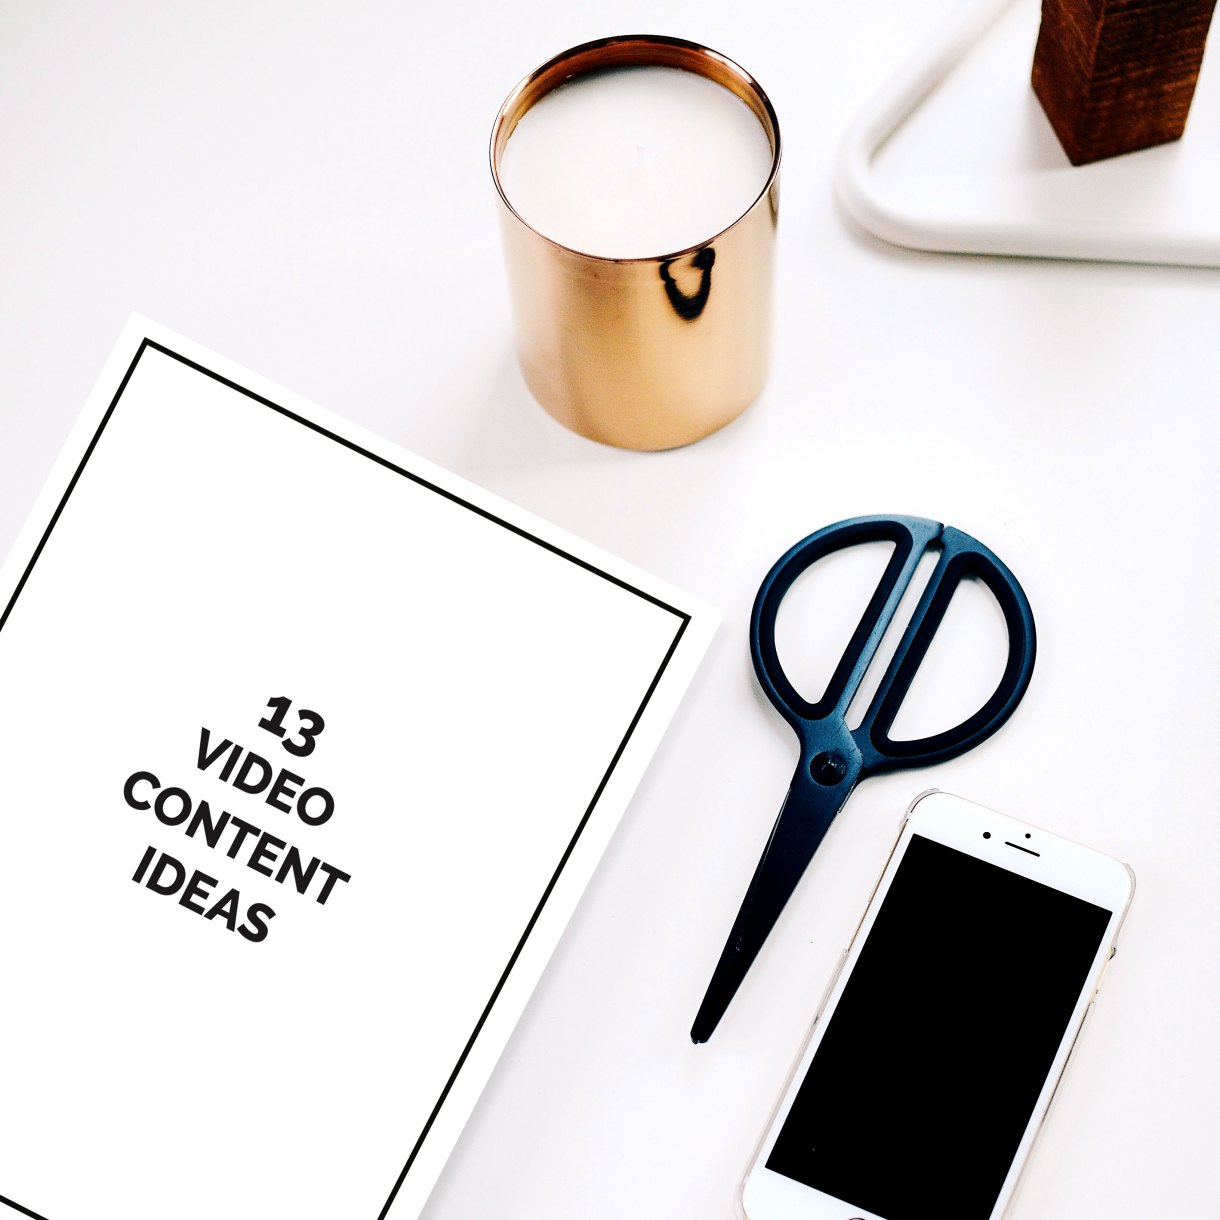 13 video content ideas